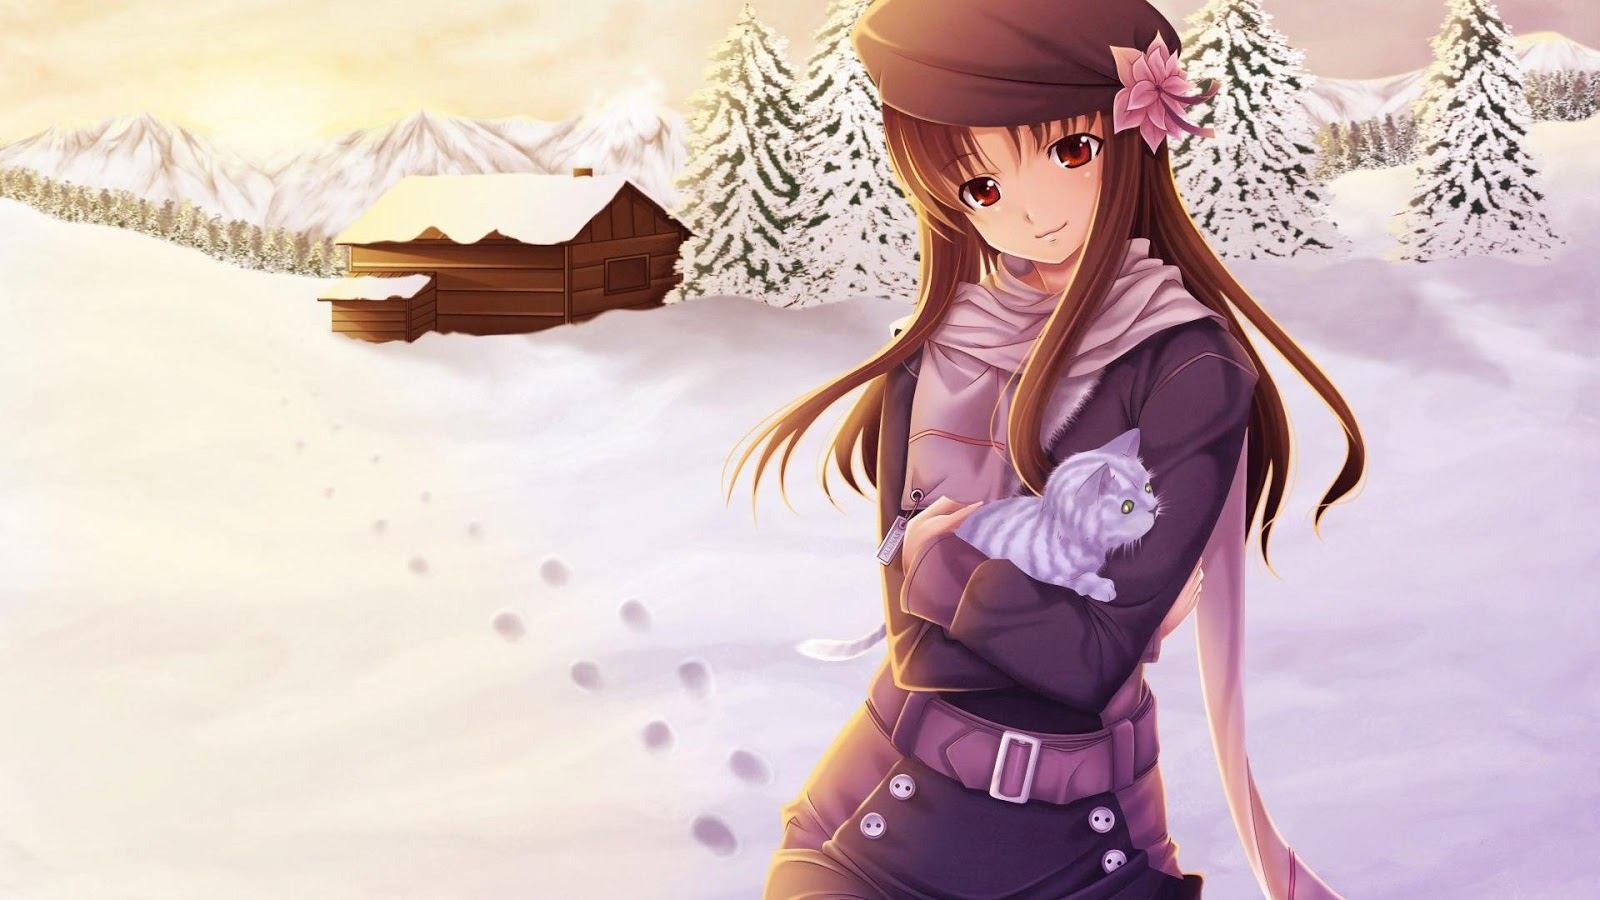 18+ Wallpaper Anime HD Keren Terbaru